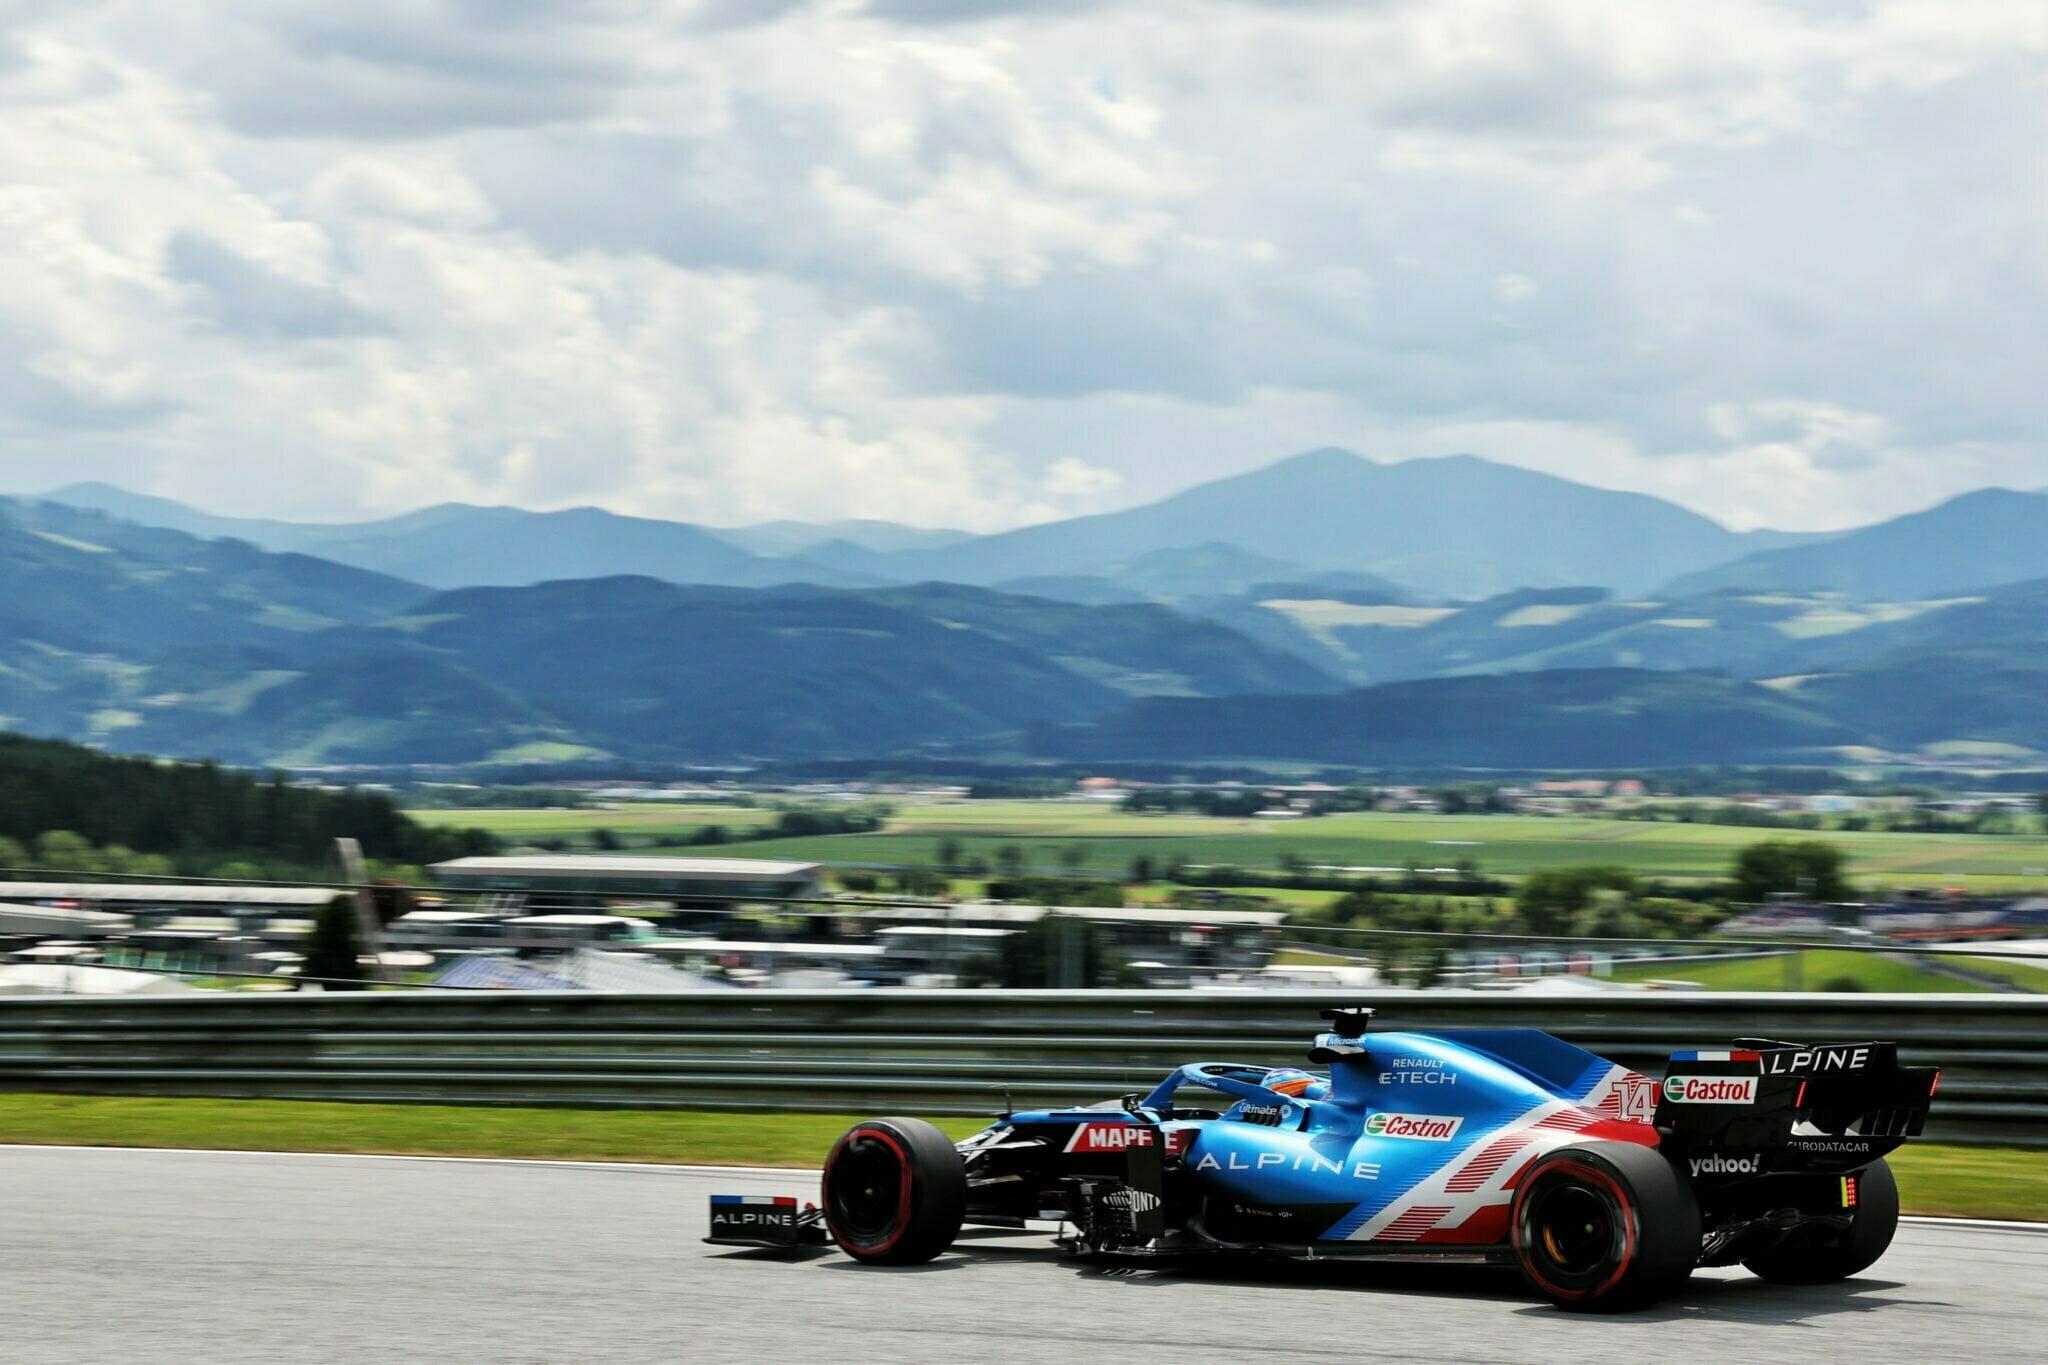 Alpine F1 Team Alonso Ocon Autriche Steiermark Grand Prix Spielberg A521 2021 17 | Alpine F1 : Alonso rapporte deux points au Grand Prix BWT de Styrie